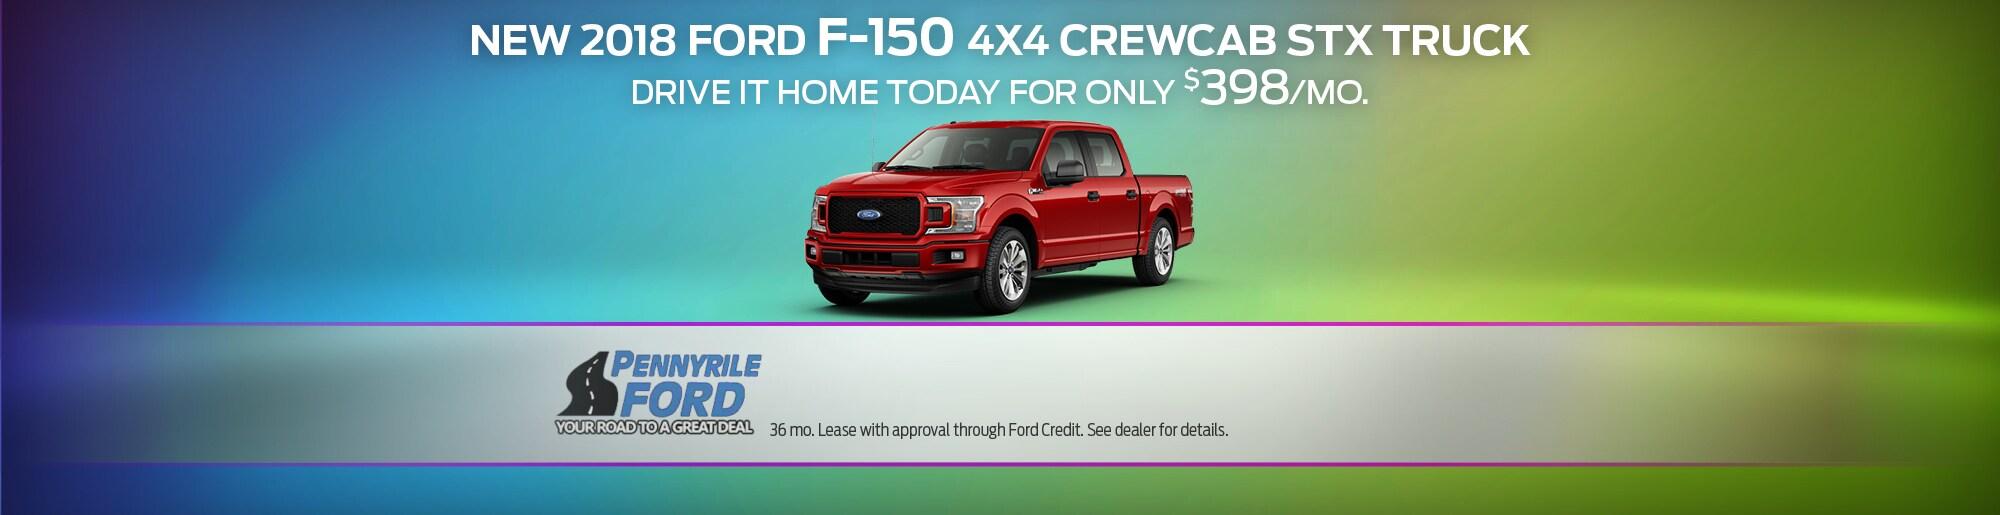 Pennyrile Ford | Ford Dealership in Hopkinsville KY